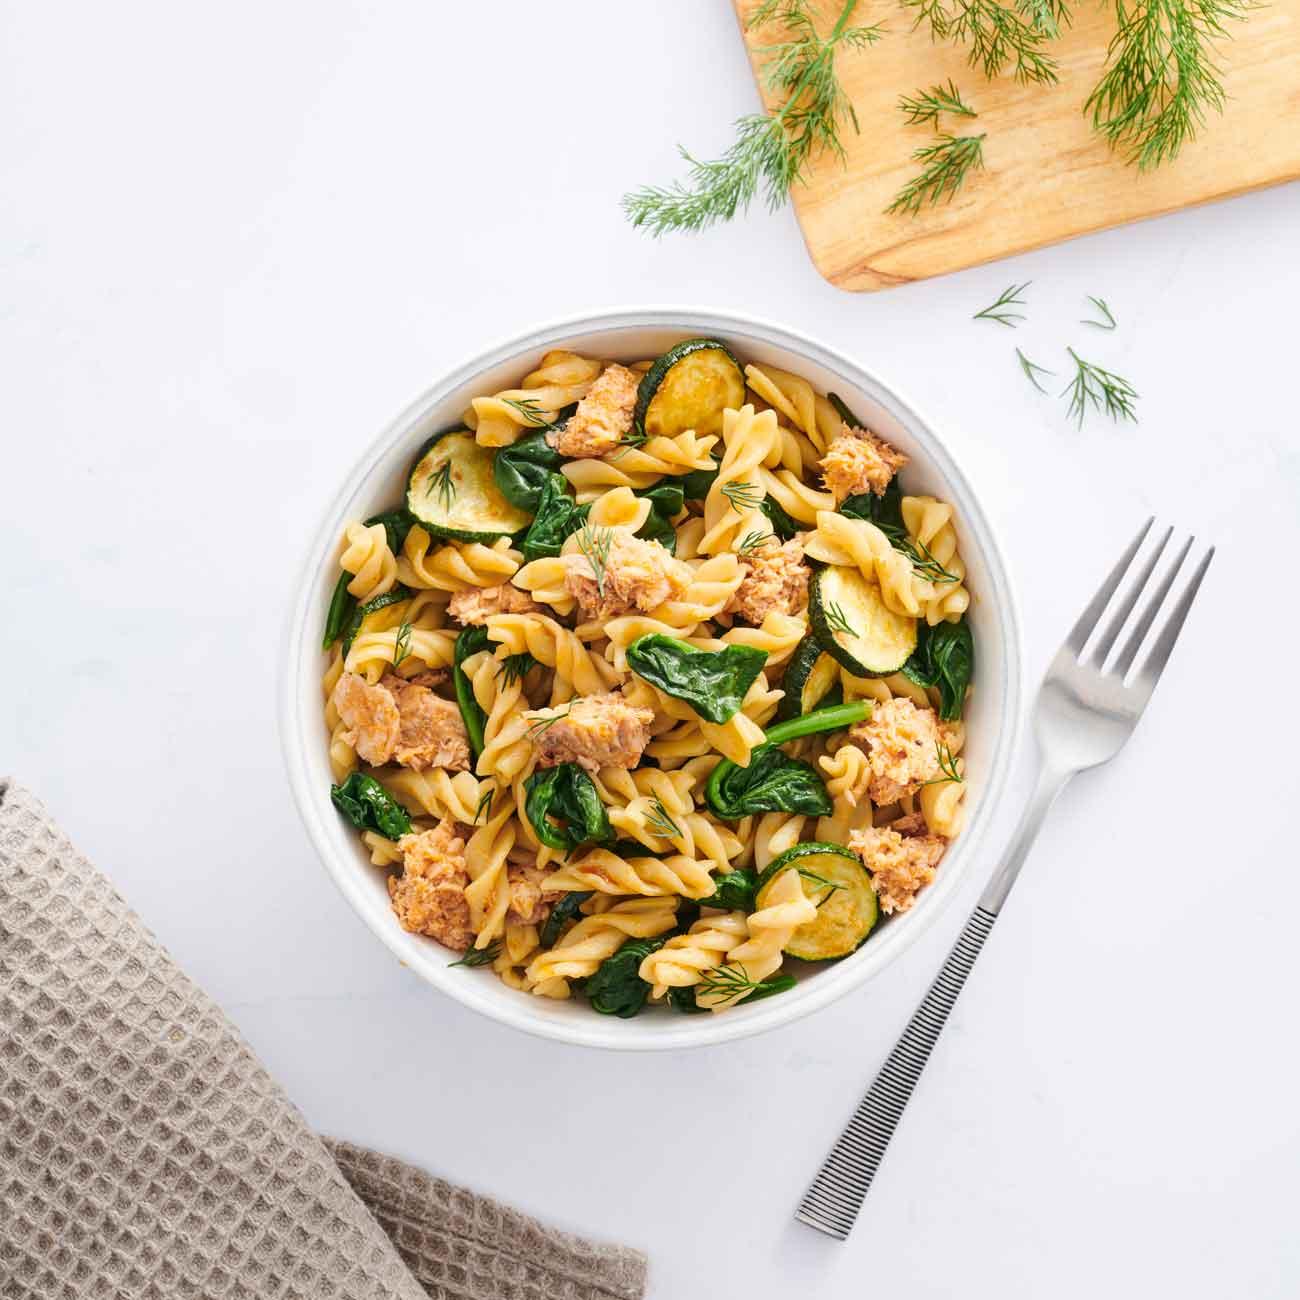 Salmon Ready Pasta with Spinach & Zucchini using Vetta Ready Pasta Classic Spirals